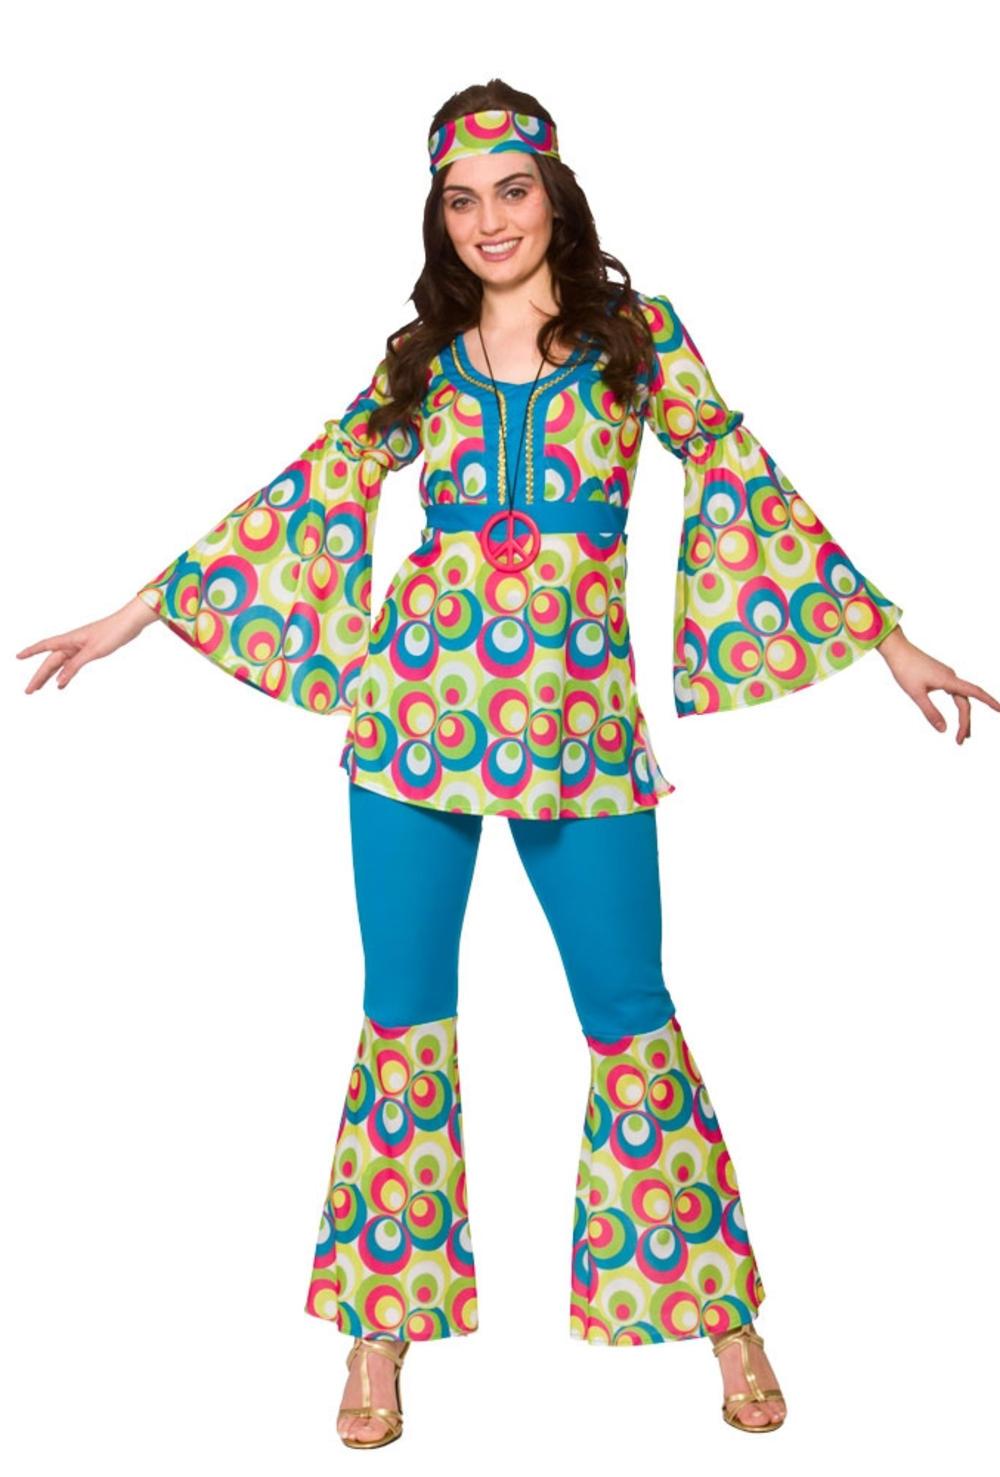 Funky Hippie Chick Ladies Fancy Dress 60s 70s Groovy Peacy Hippy Adults Costume